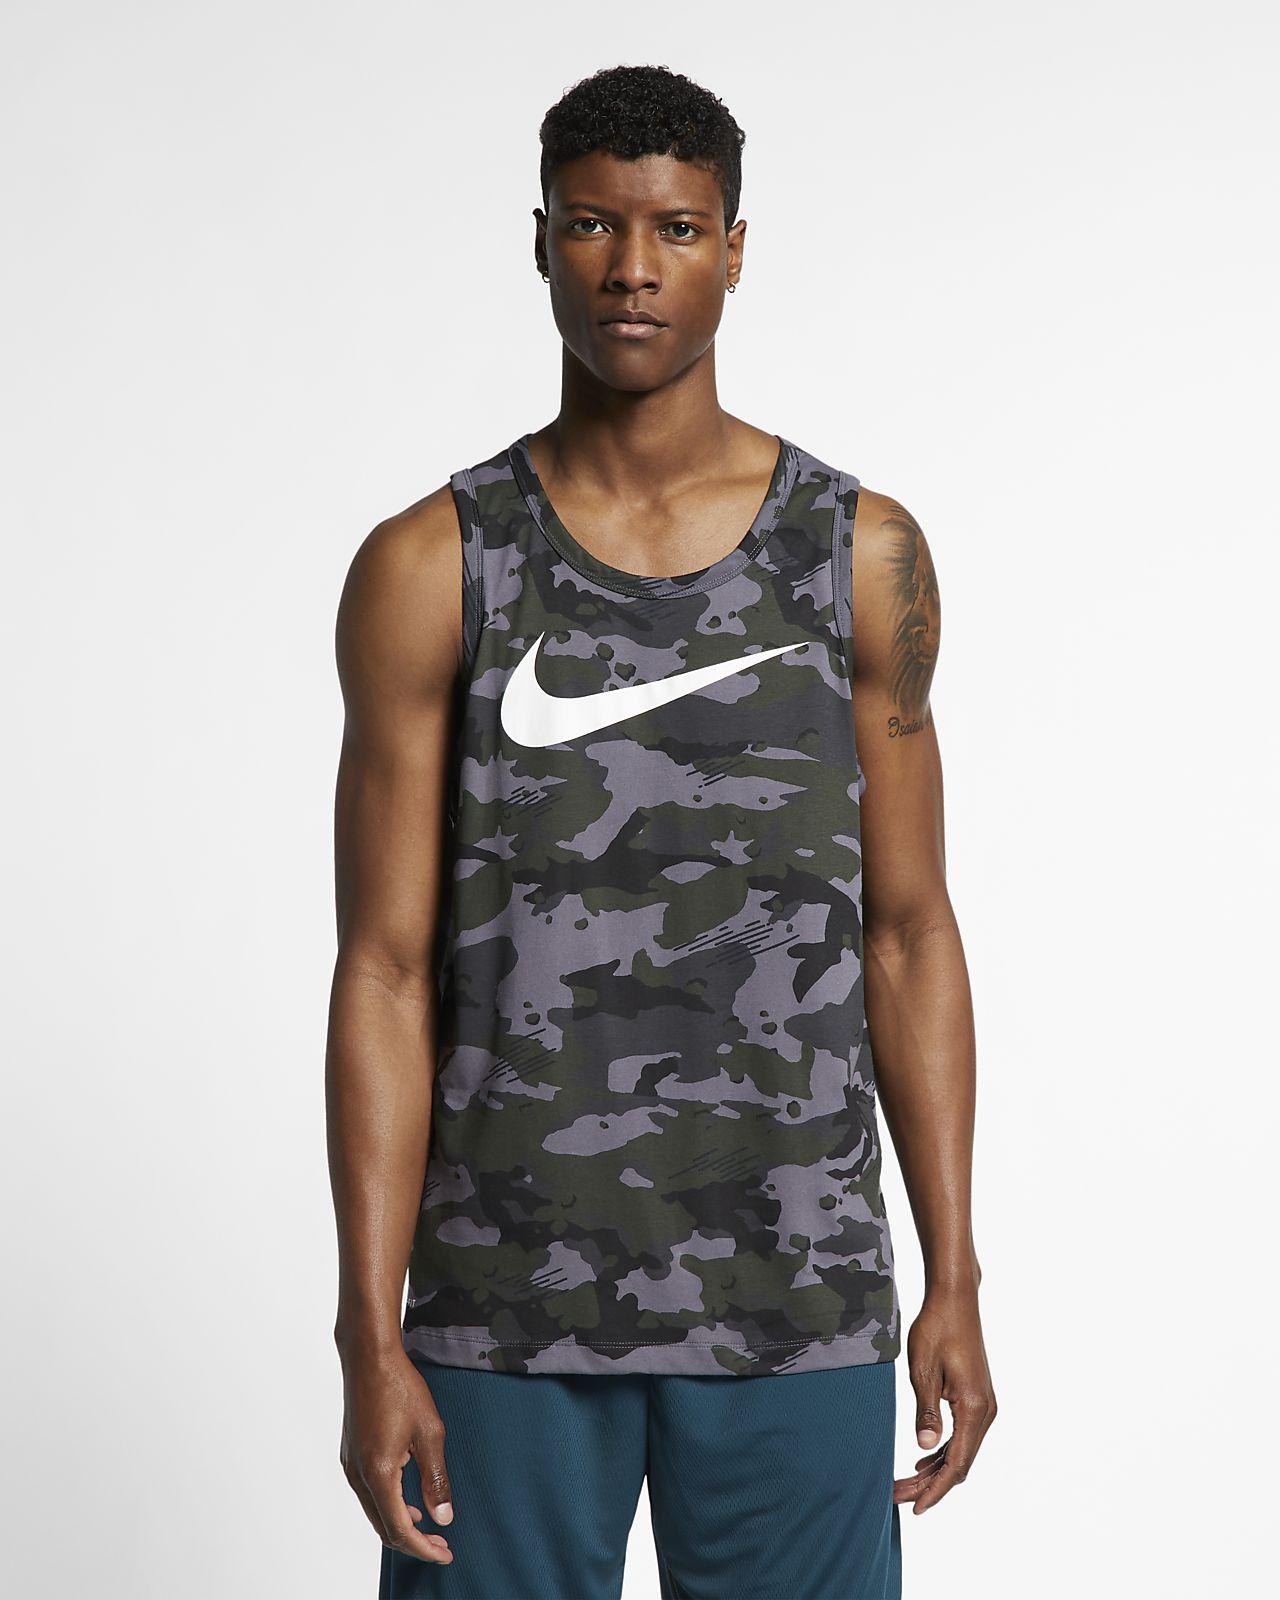 low priced cd7dc 0e5bf Men s Camo Training Tank. Nike Dri-FIT